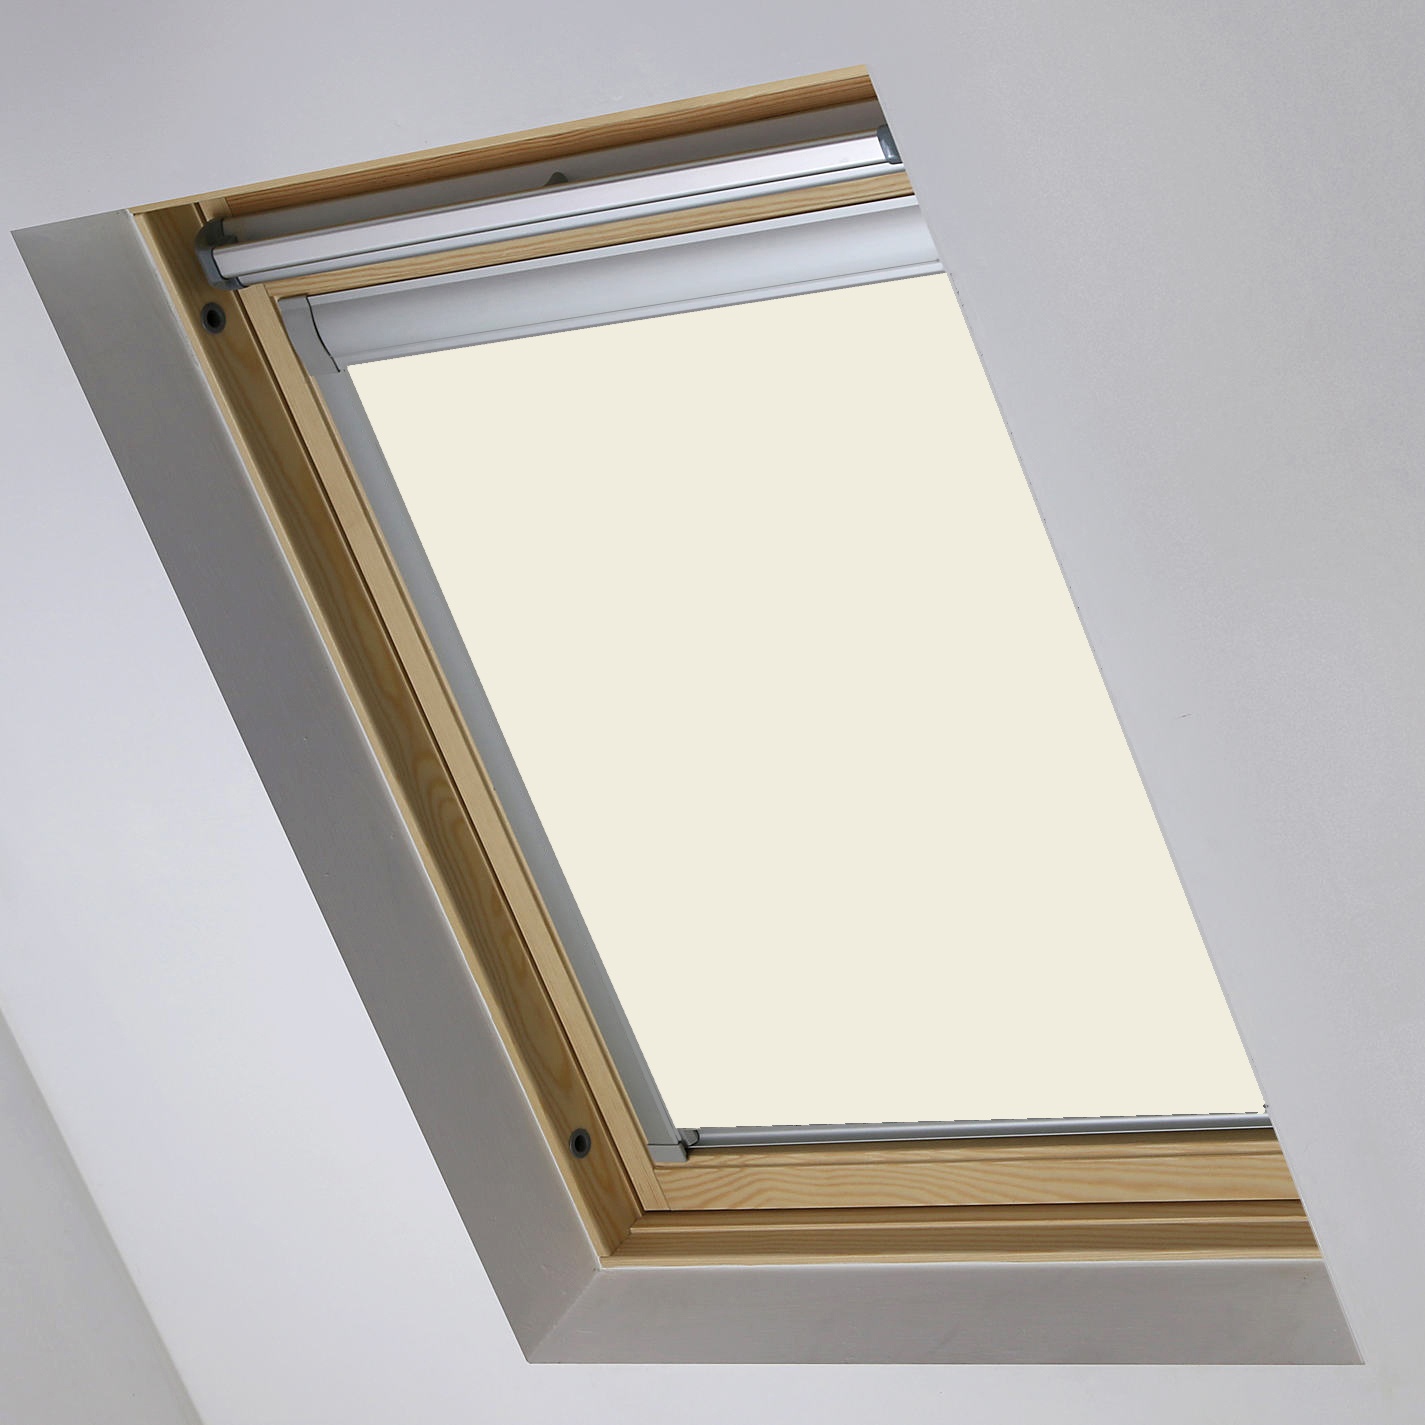 0017-002 Bog Cotton Skylight blind fully closed